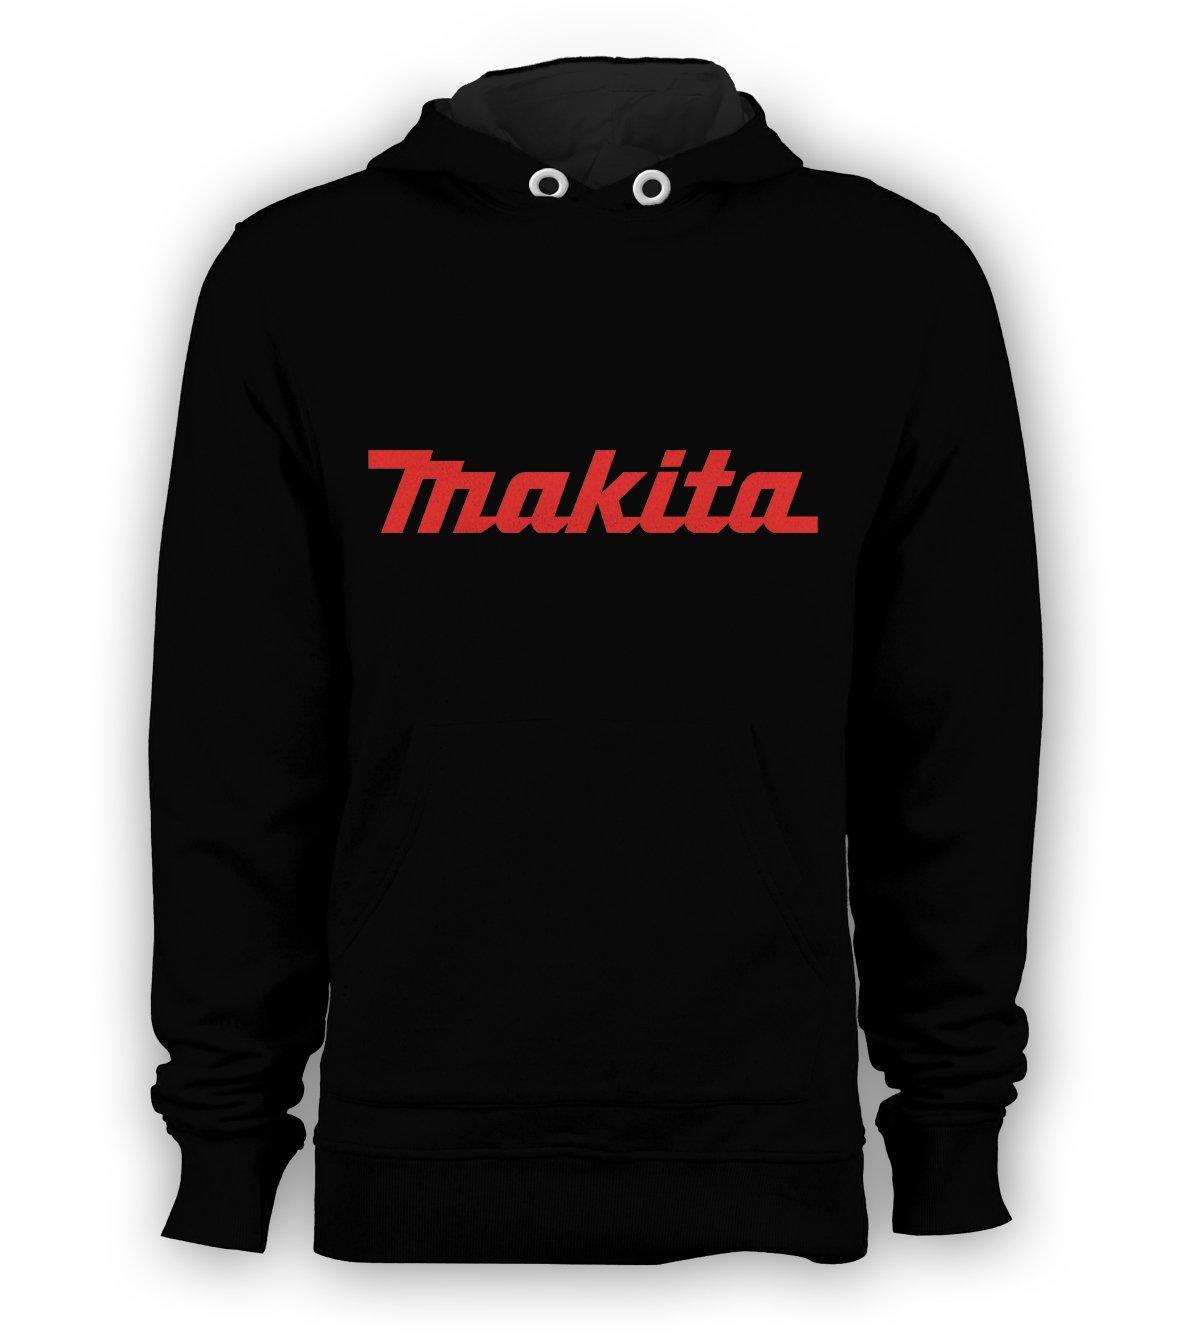 Makita Tool Logo Pullover Hoodie Men Sweatshirts Size S to 3XL New Black